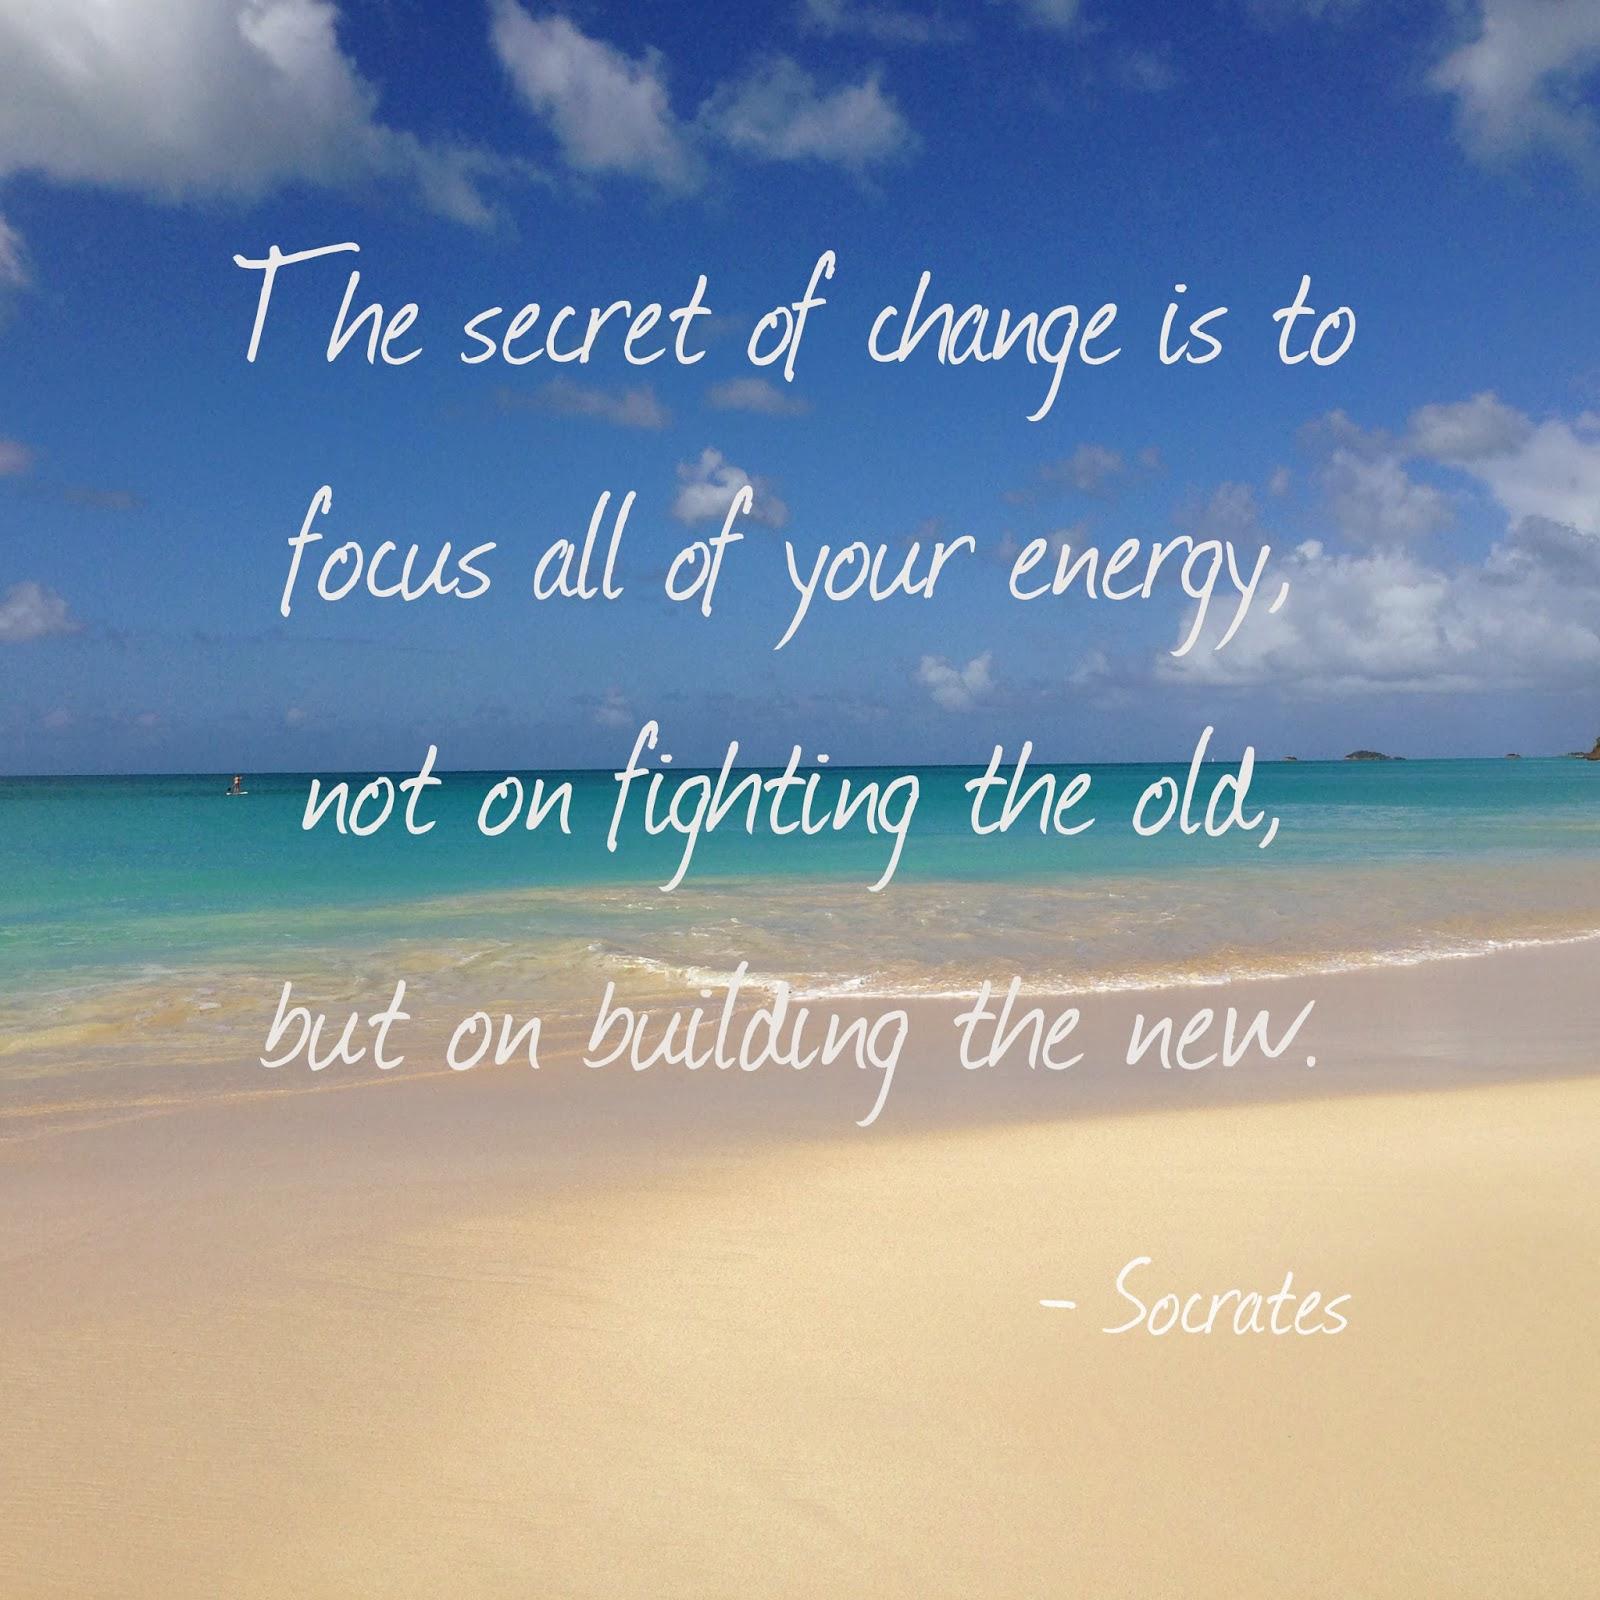 The Secret of Change quote FGK